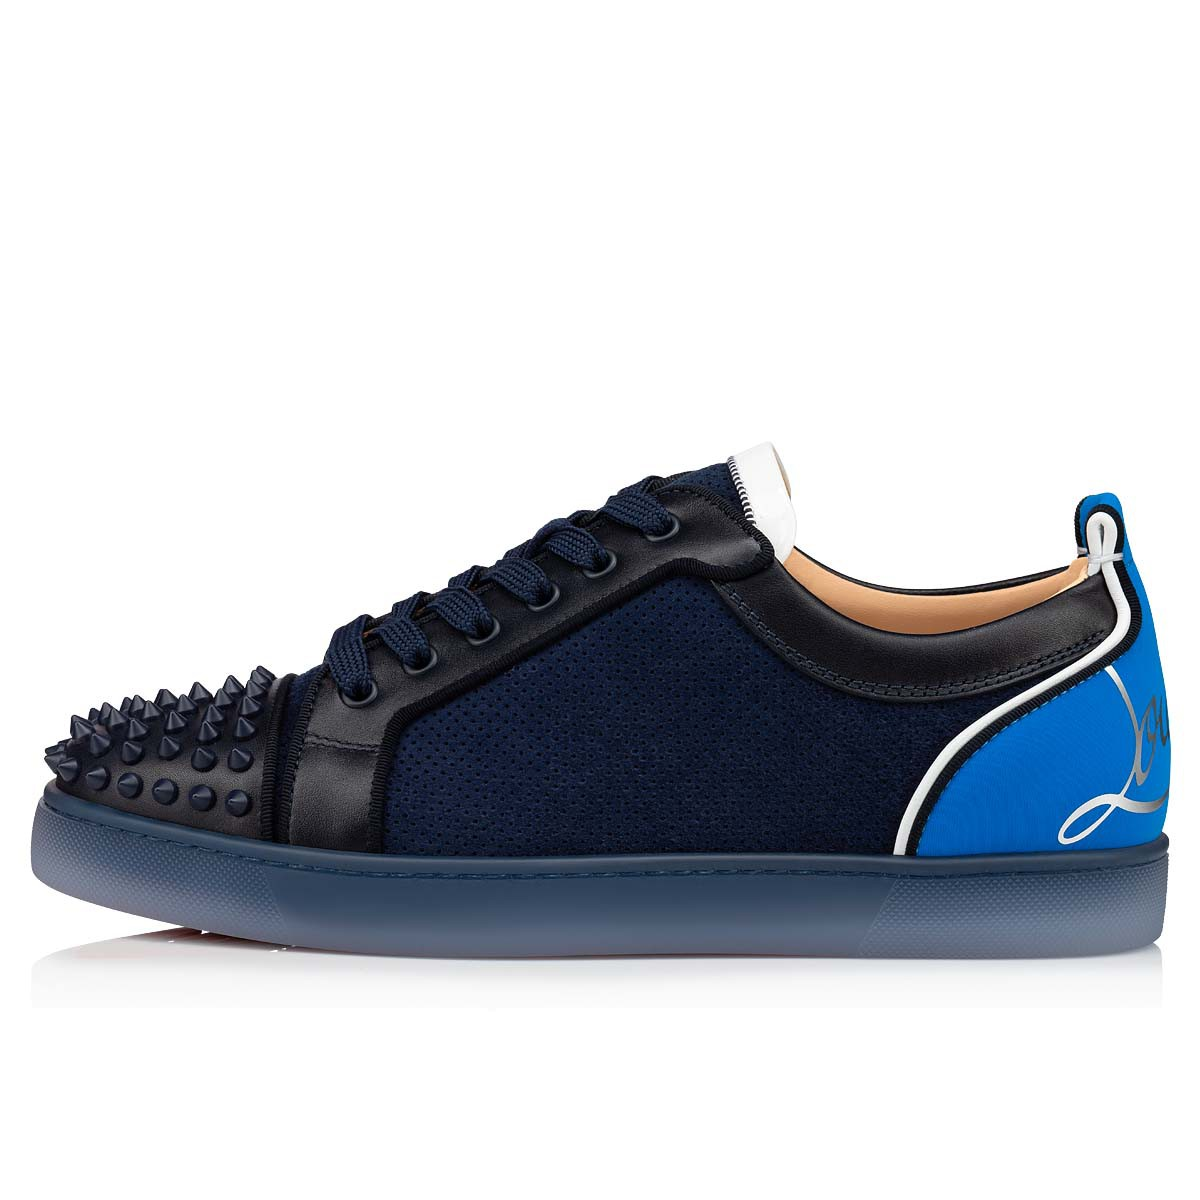 Shoes - Fun Louis Junior Spikes Flat - Christian Louboutin